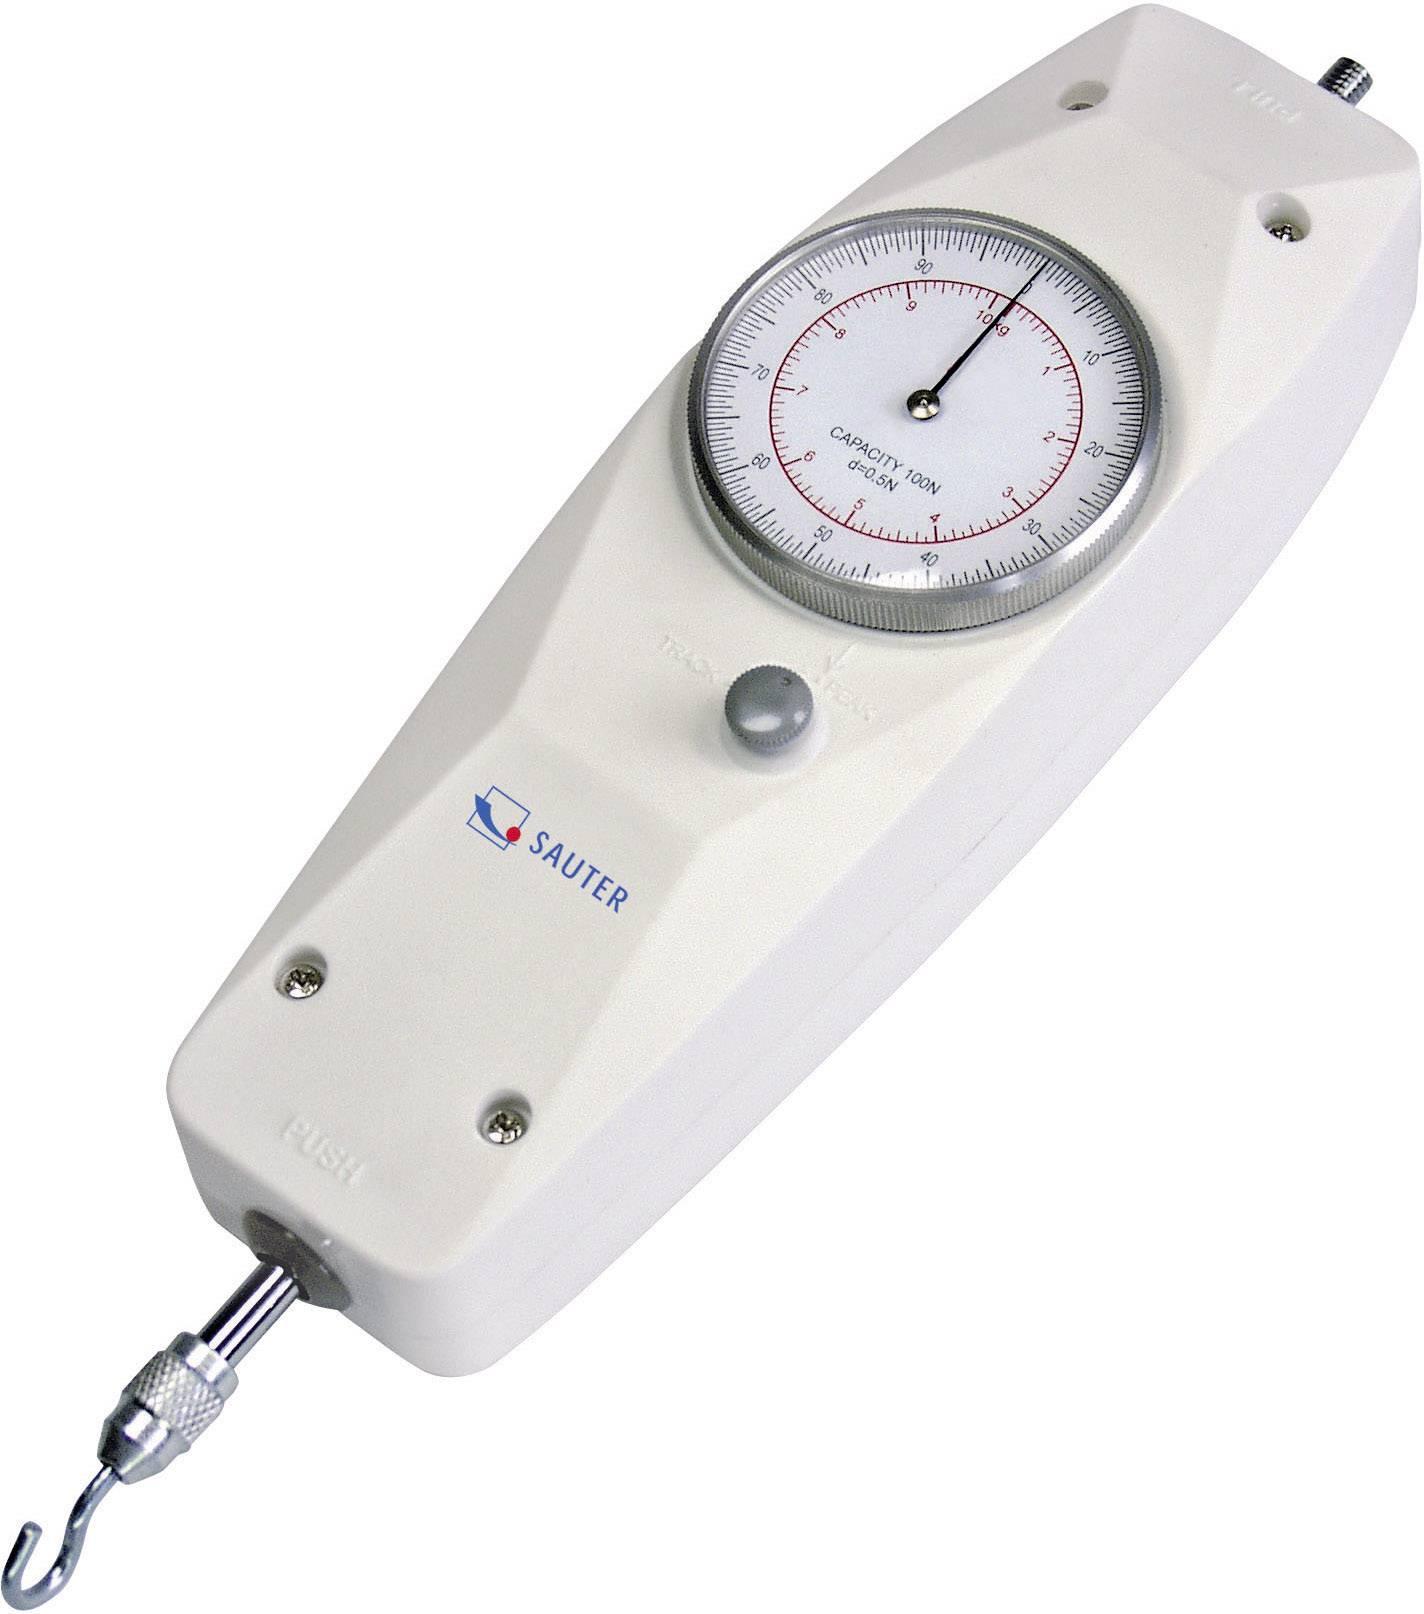 Sauter FA 200 Kraftmessgerät, Newton-Meter 200 N Kalibrováno dle ISO